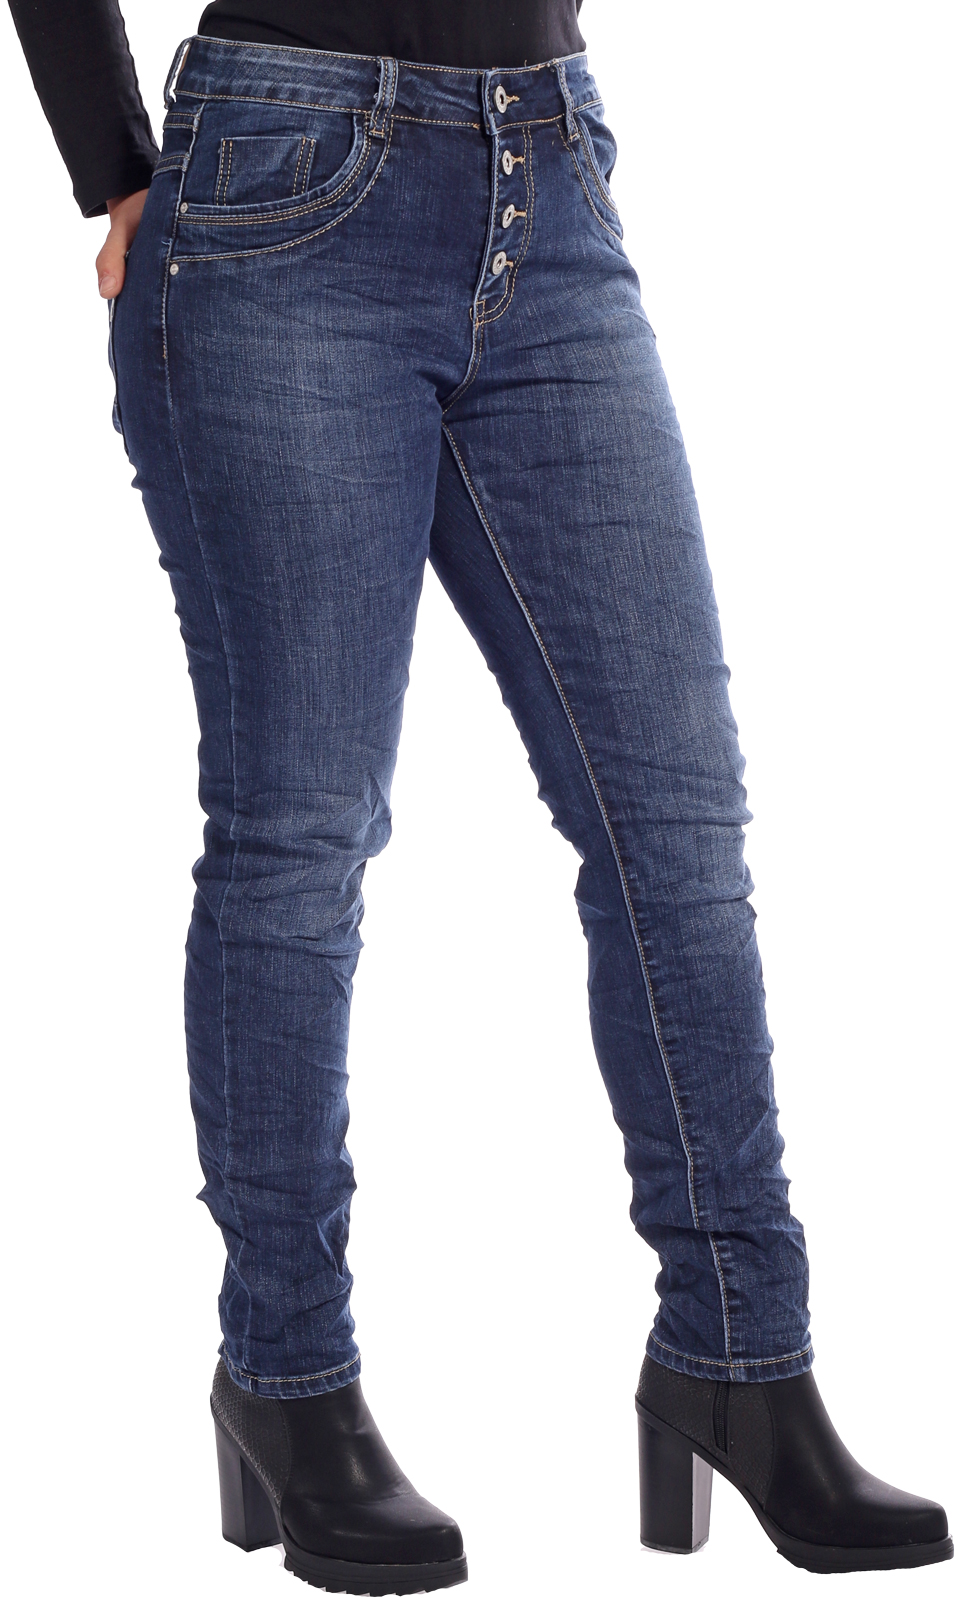 KAROSTAR Baggy Damen Jeans 4 Button Style Jeansblau New Collection Gr 38-48